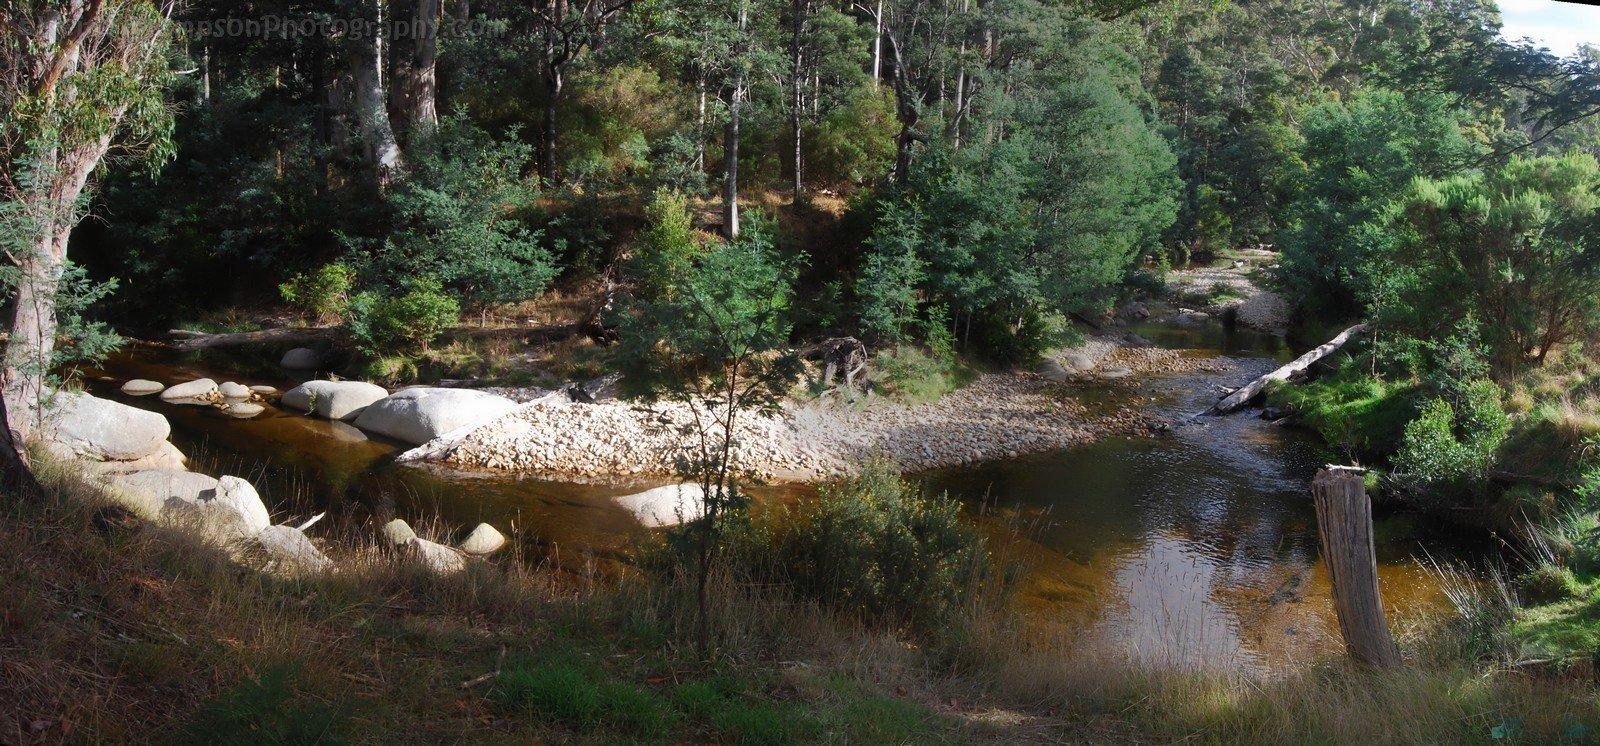 Groom River